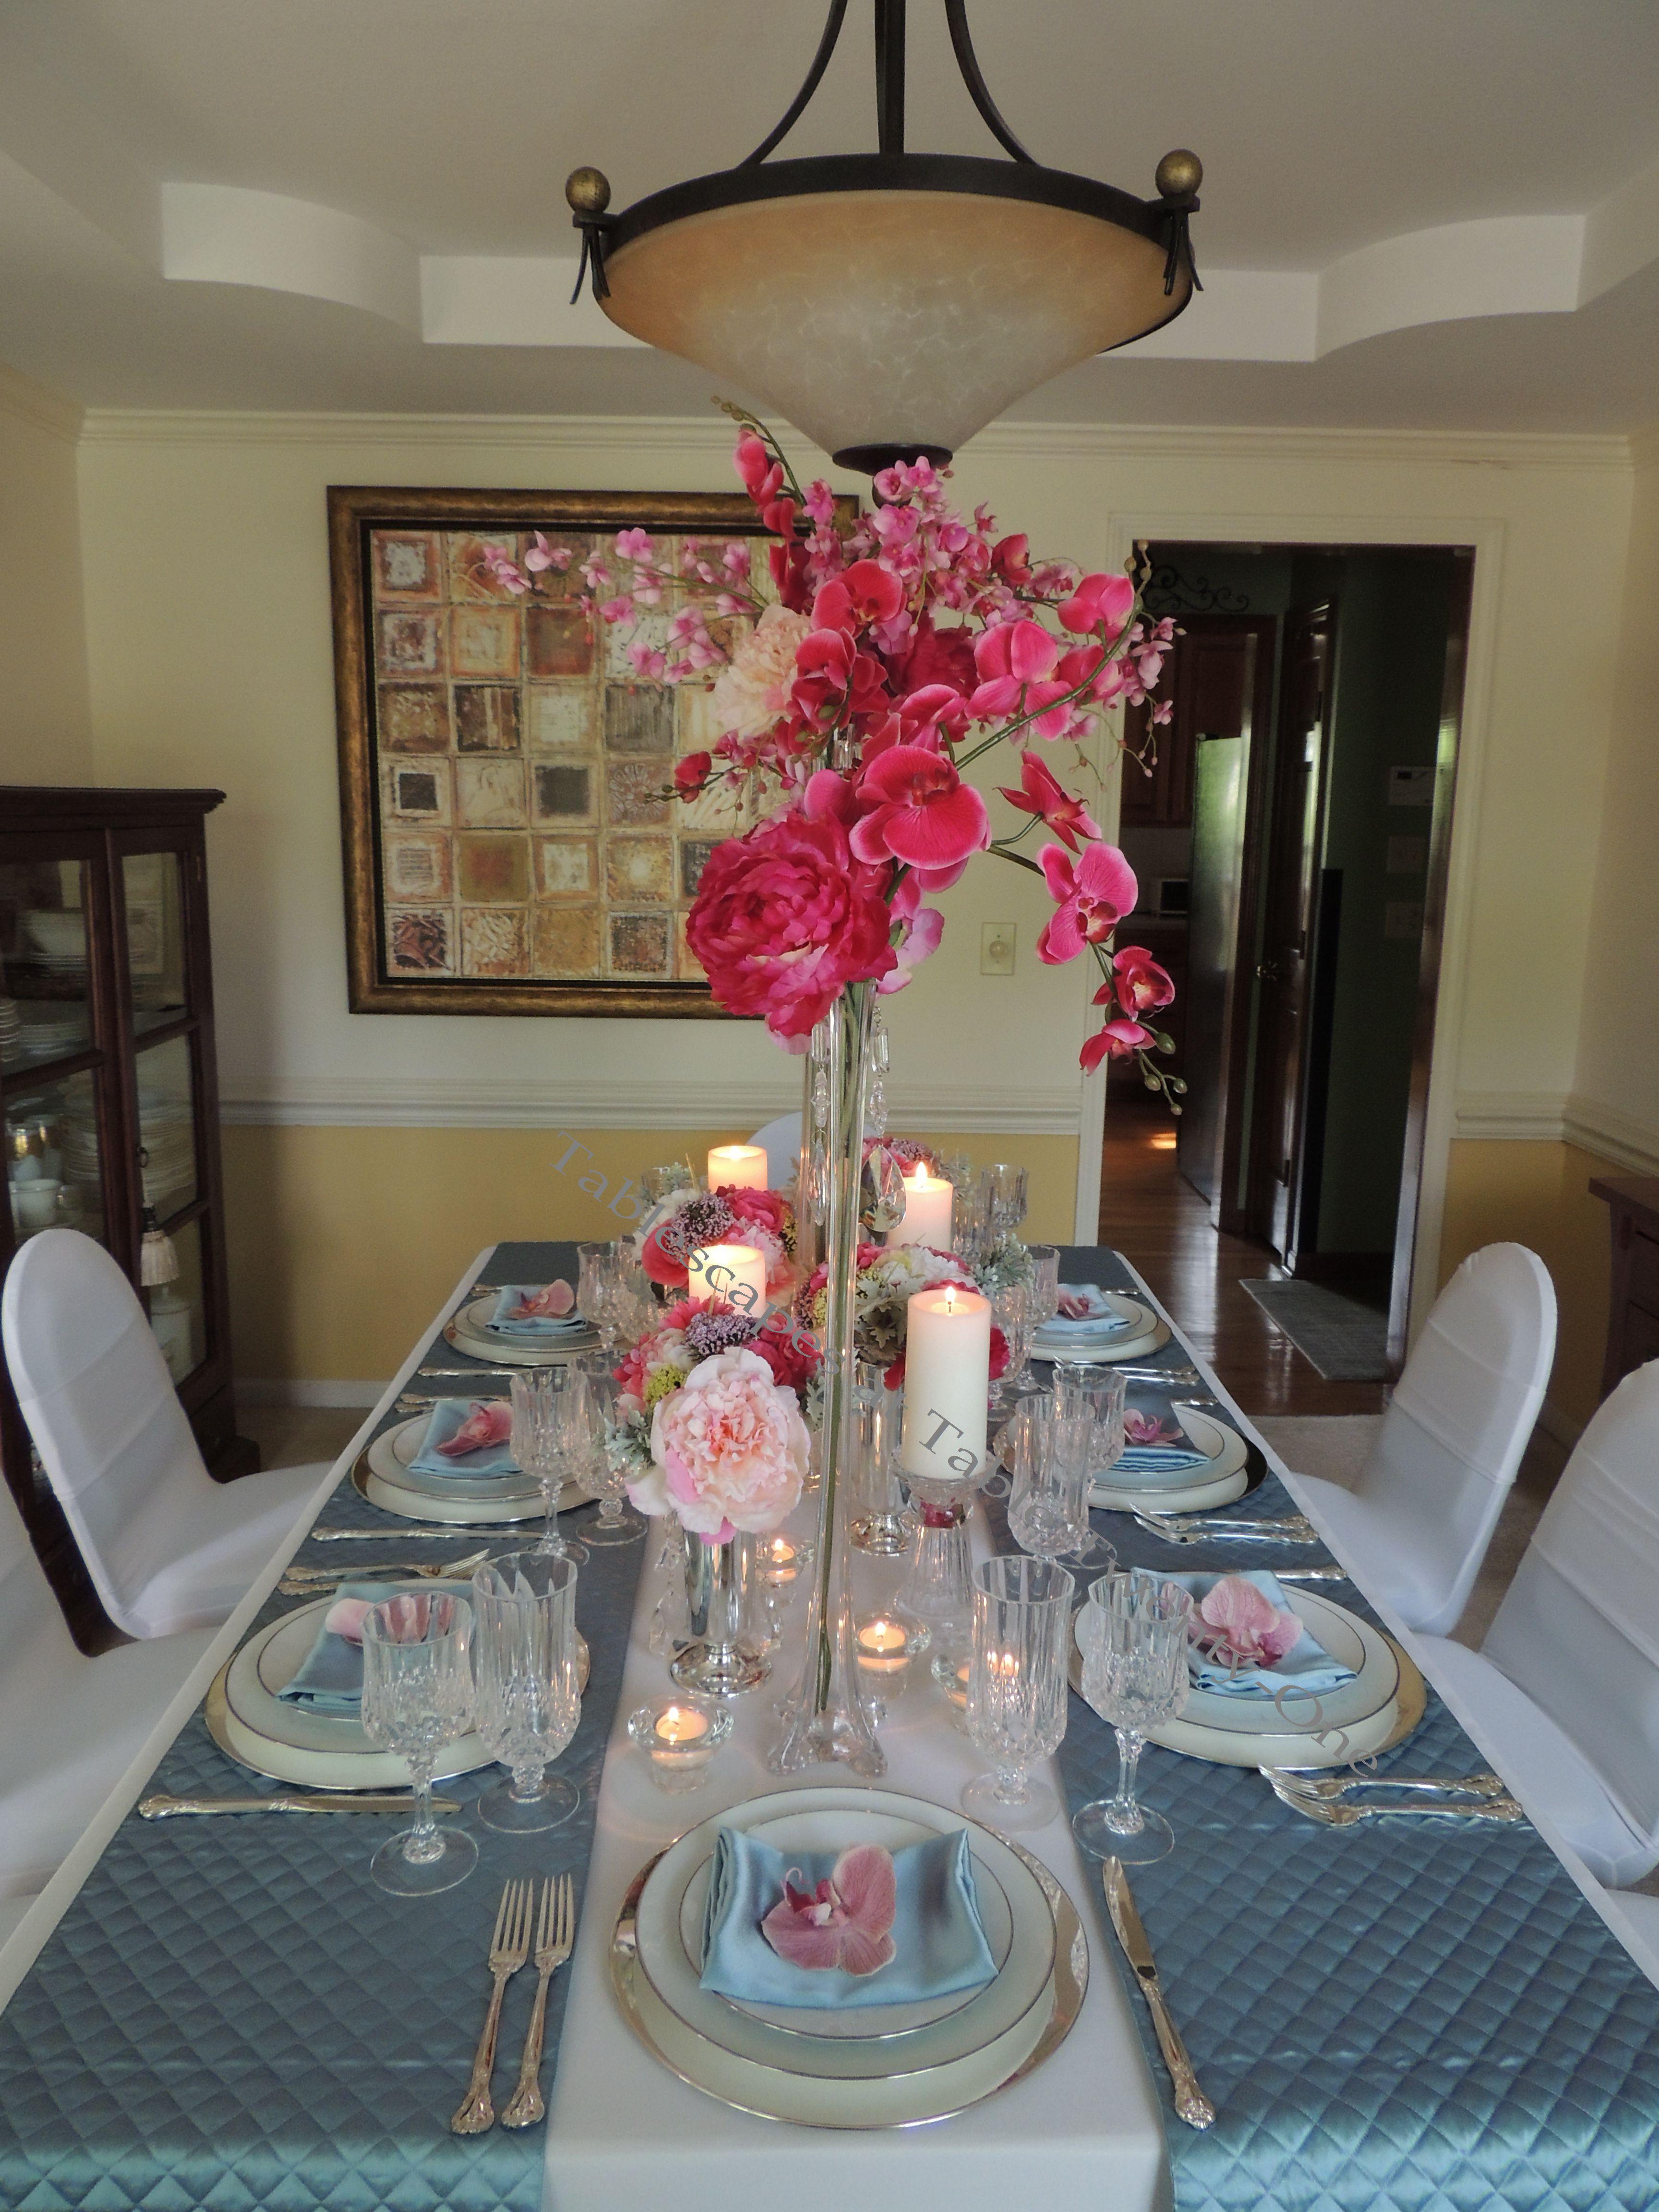 Tablescapes at Table Twenty-One, www.tabletwentyone.wordpress.com: My Sister's Wedding China - Table